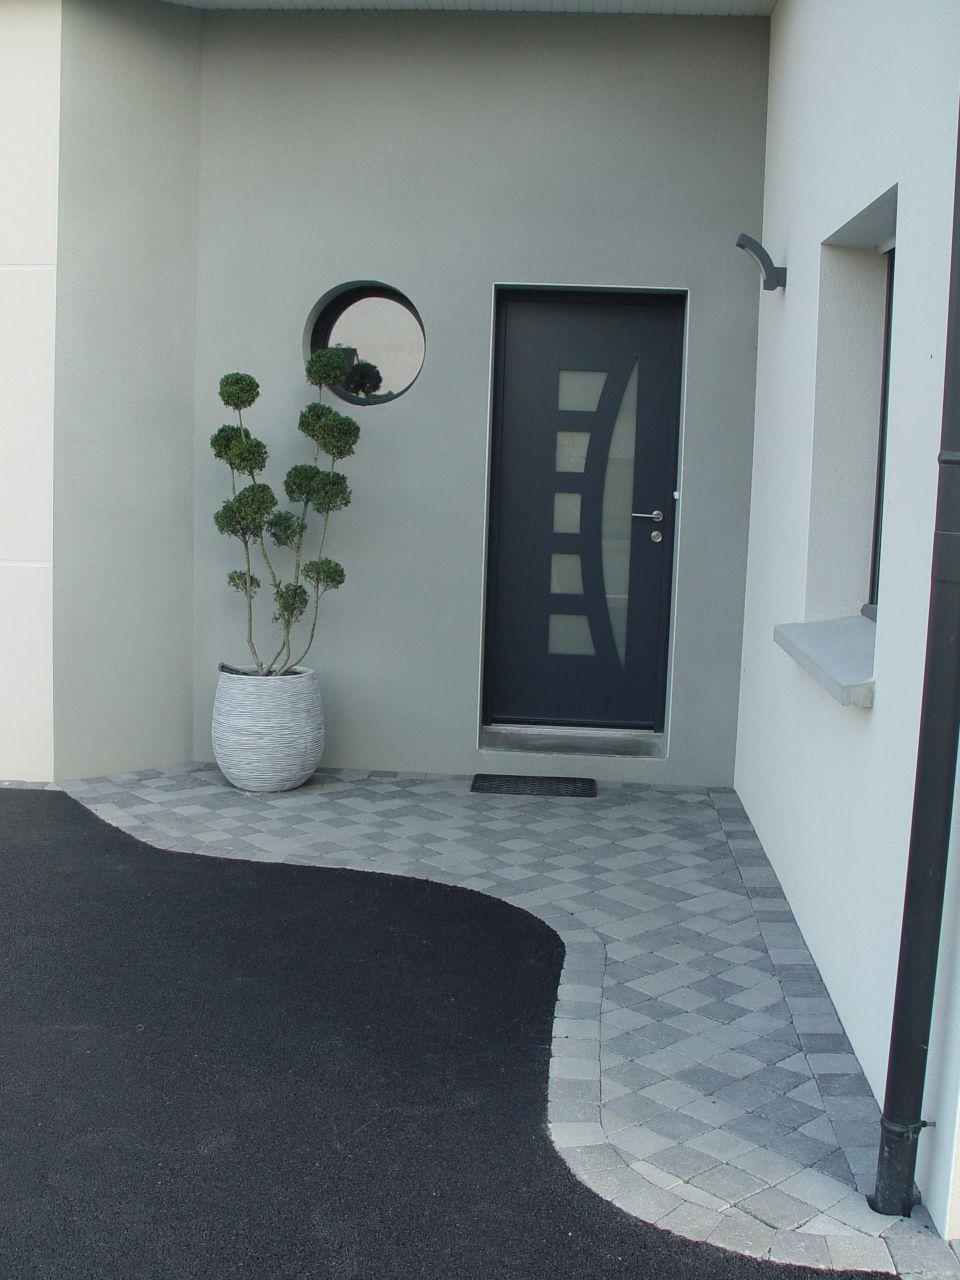 Villas, toulouse and atelier on pinterest